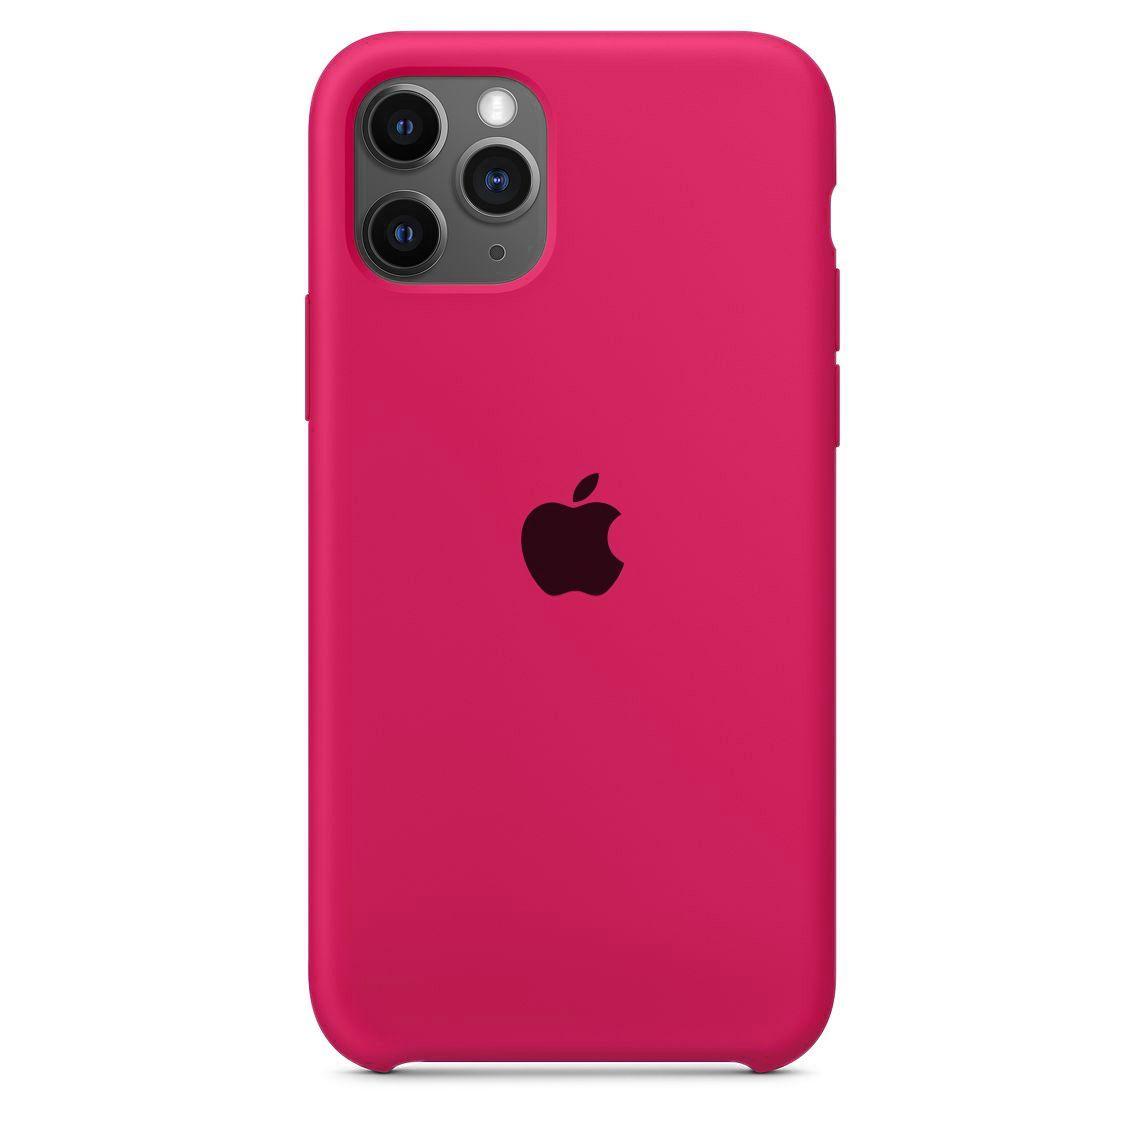 Capa Original Silicone Case IPhone 11 Pro Max Rosa Pink SC-11PROMAX-RP